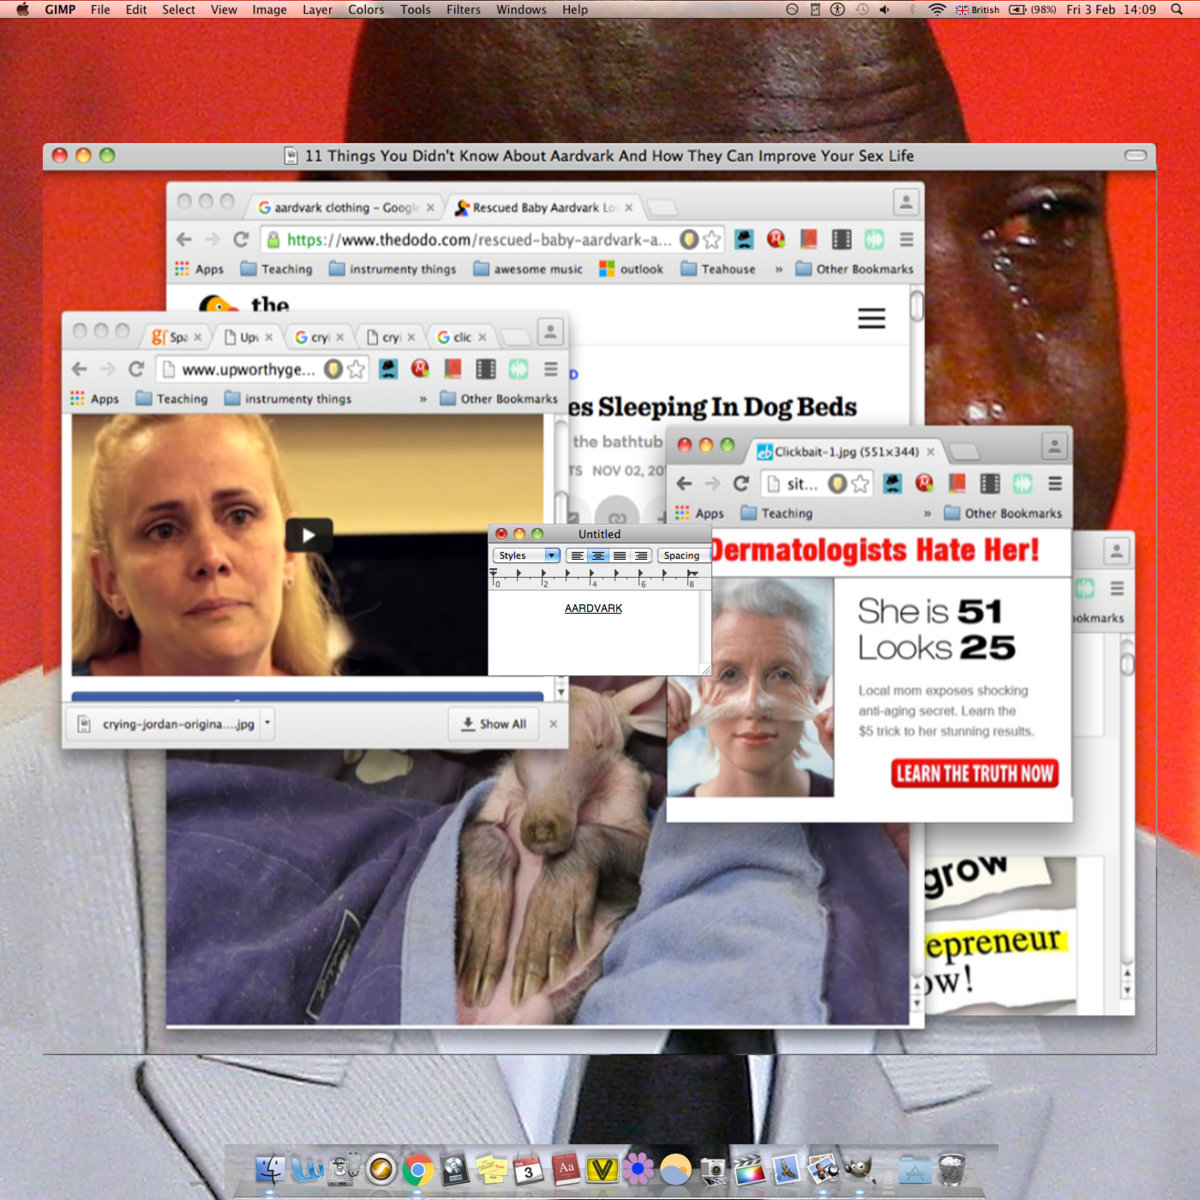 Aardvark_SEXSEXSEX